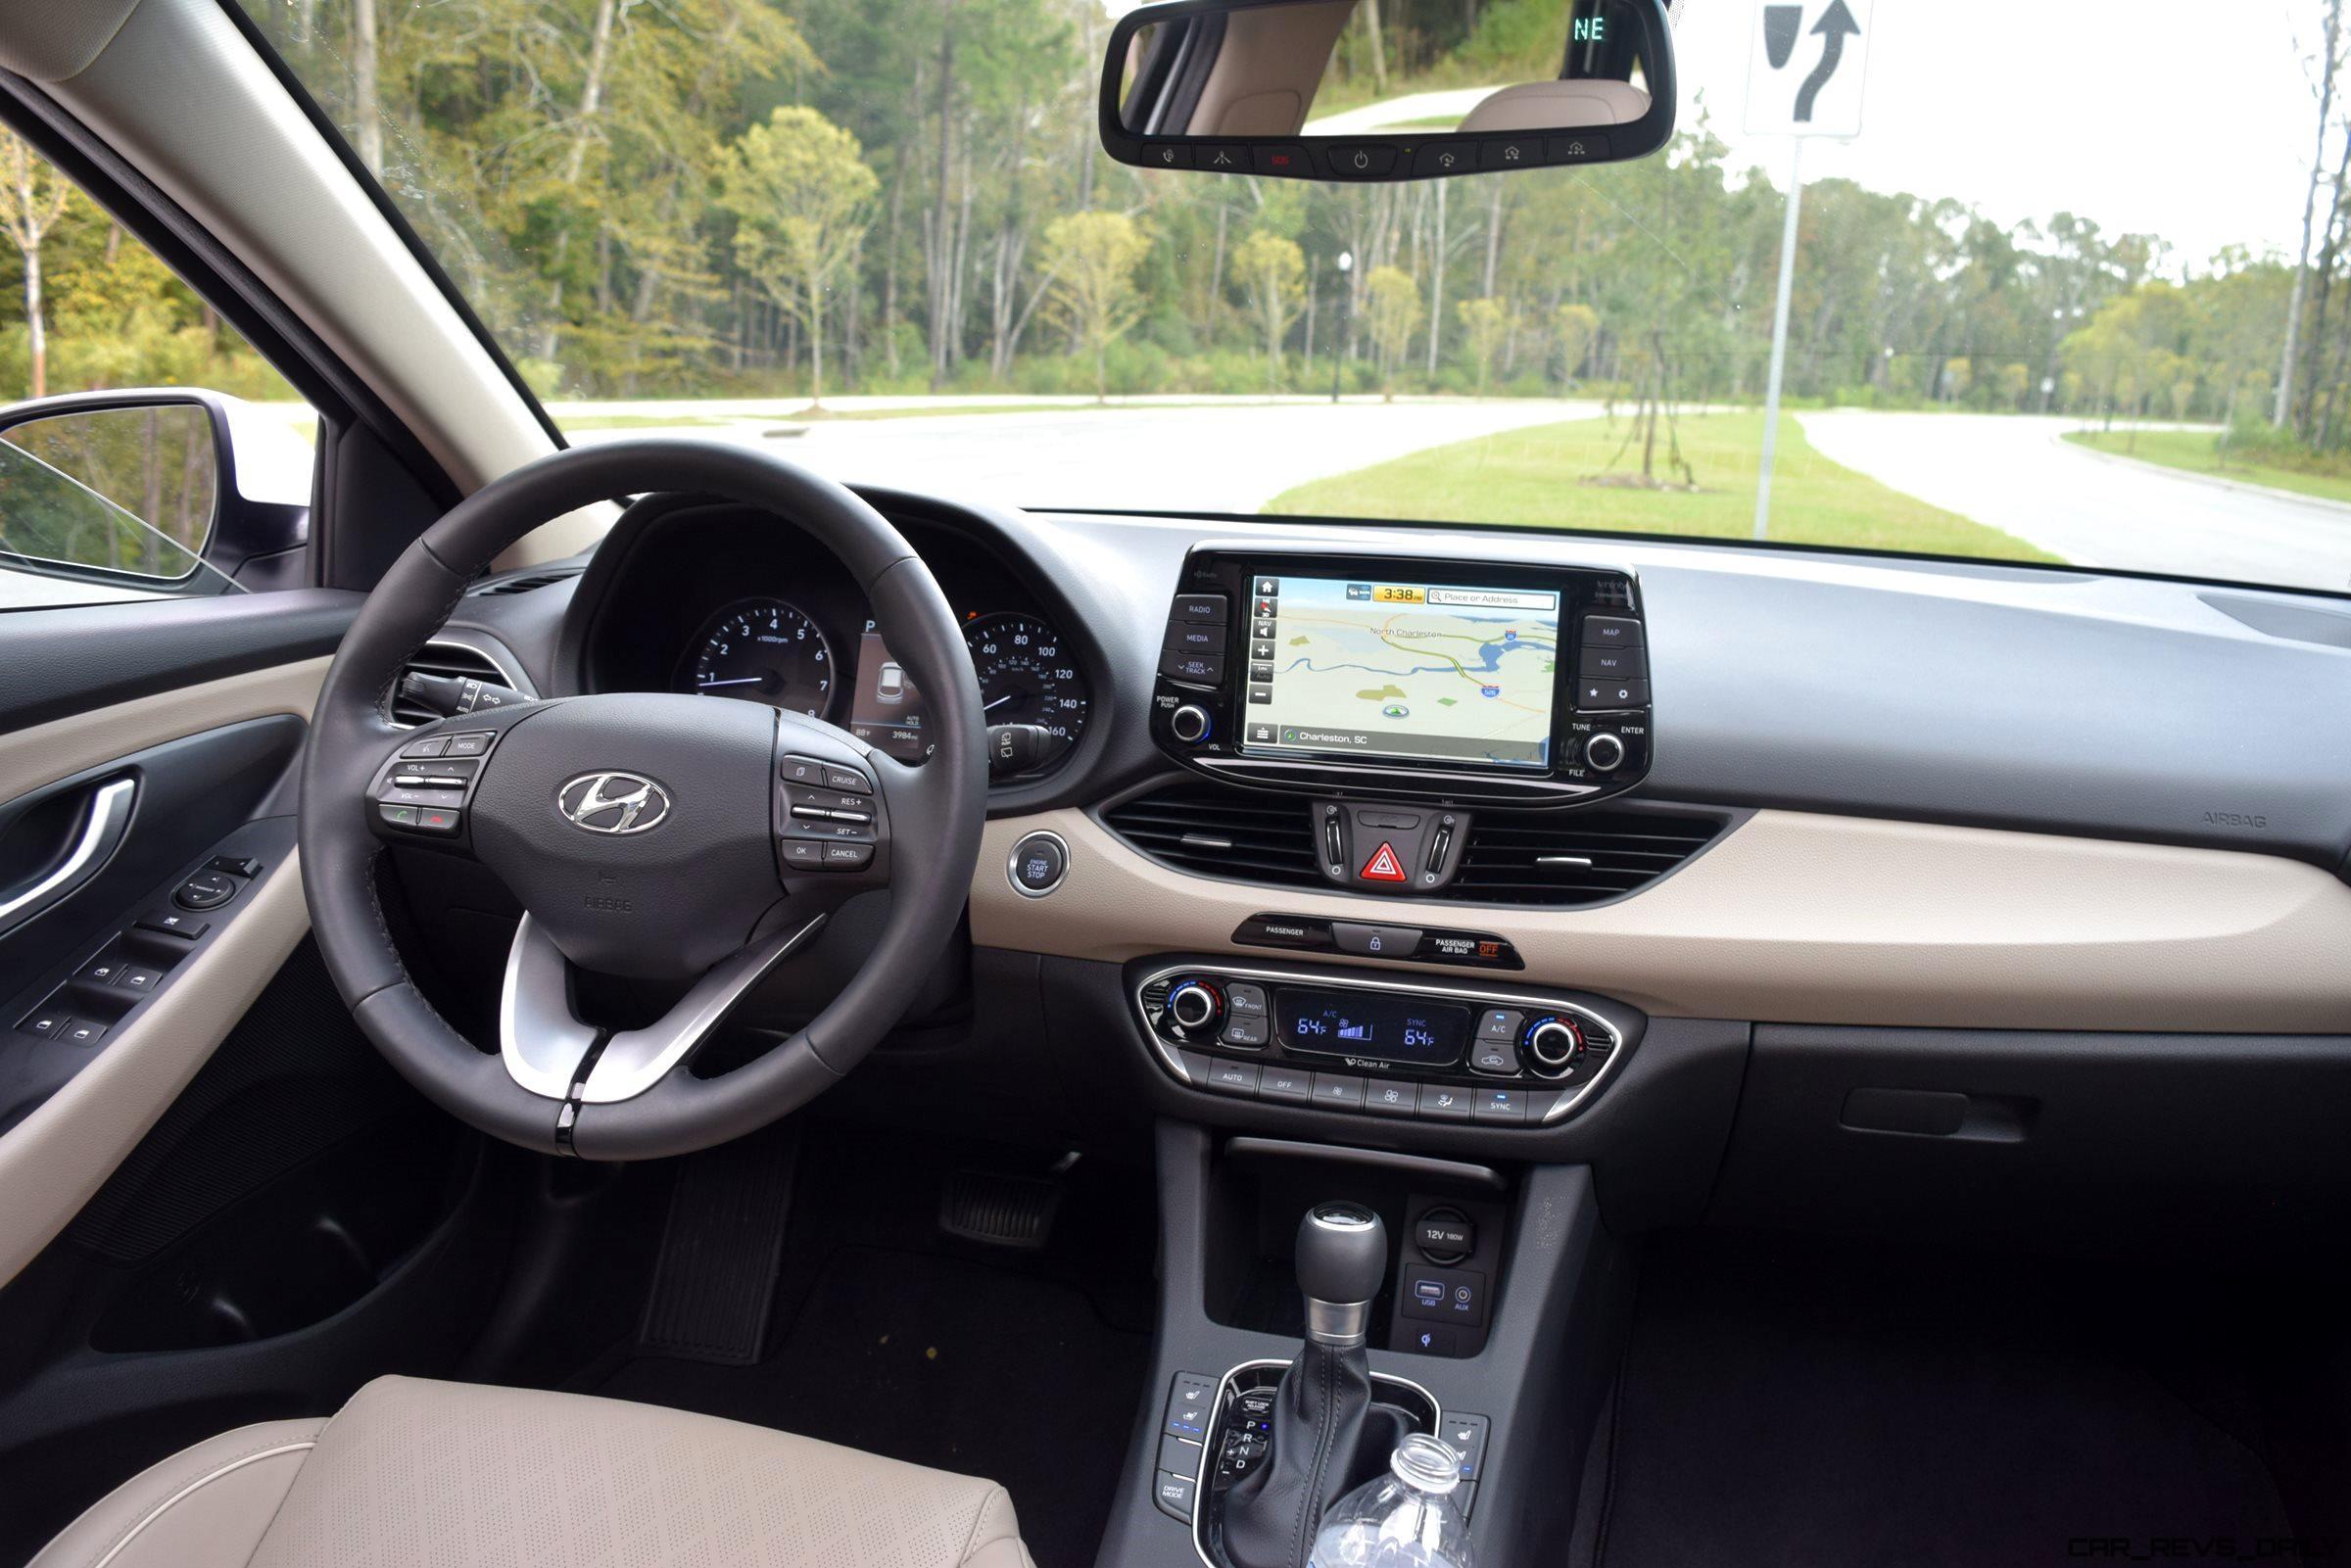 2018 Hyundai Elantra GT Base Automatic - Road Test Review ...